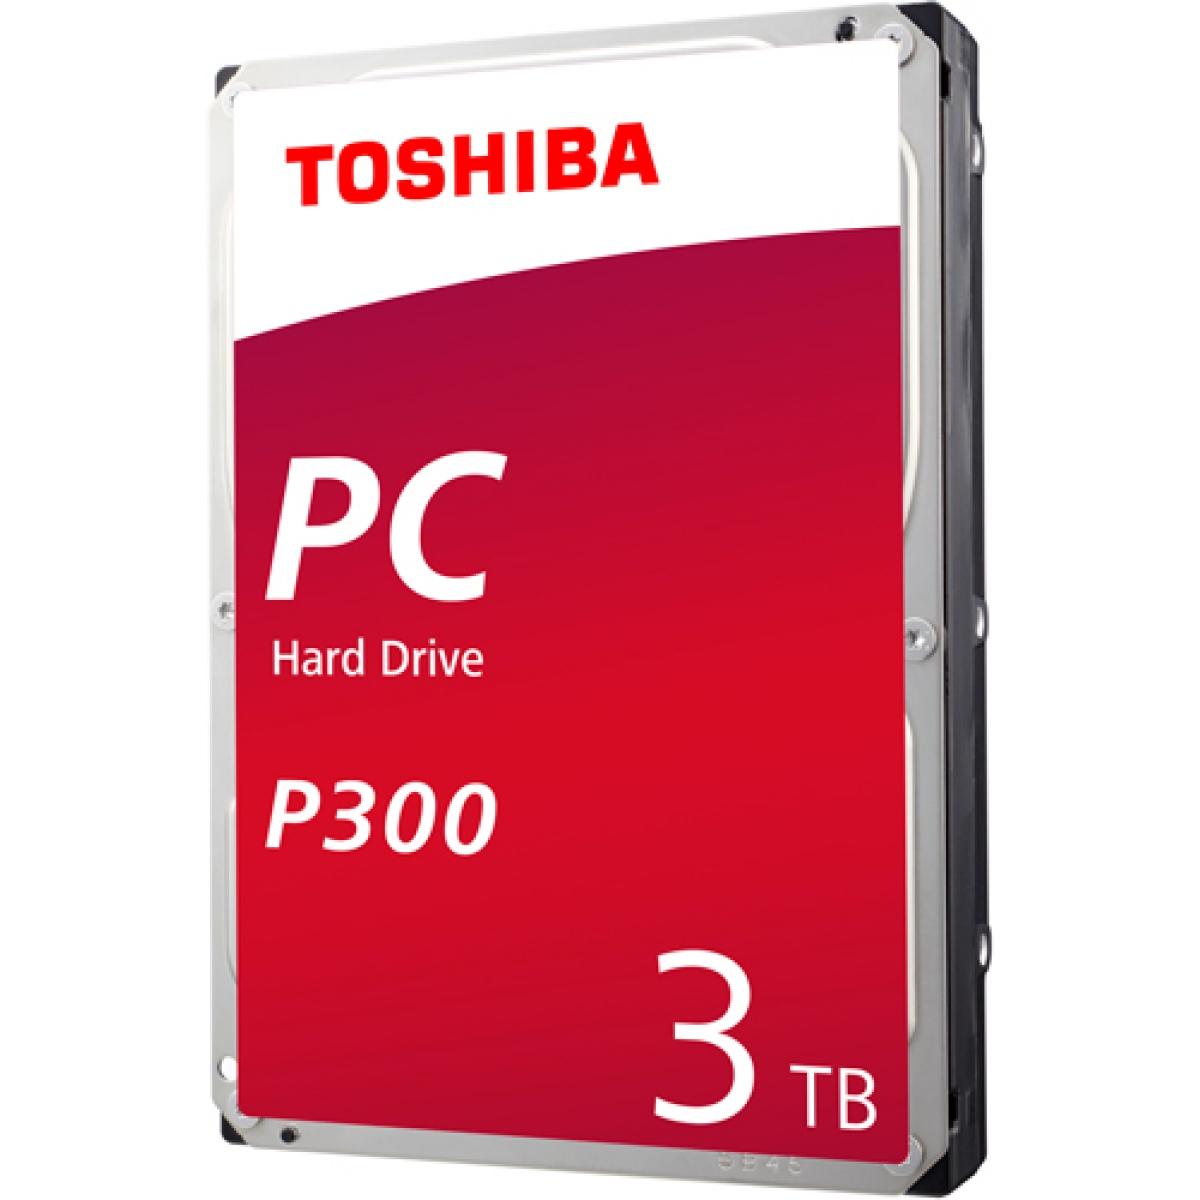 HD Toshiba P300 3TB, SATA III, 7200RPM, 64MB, HDWD130XZSTA